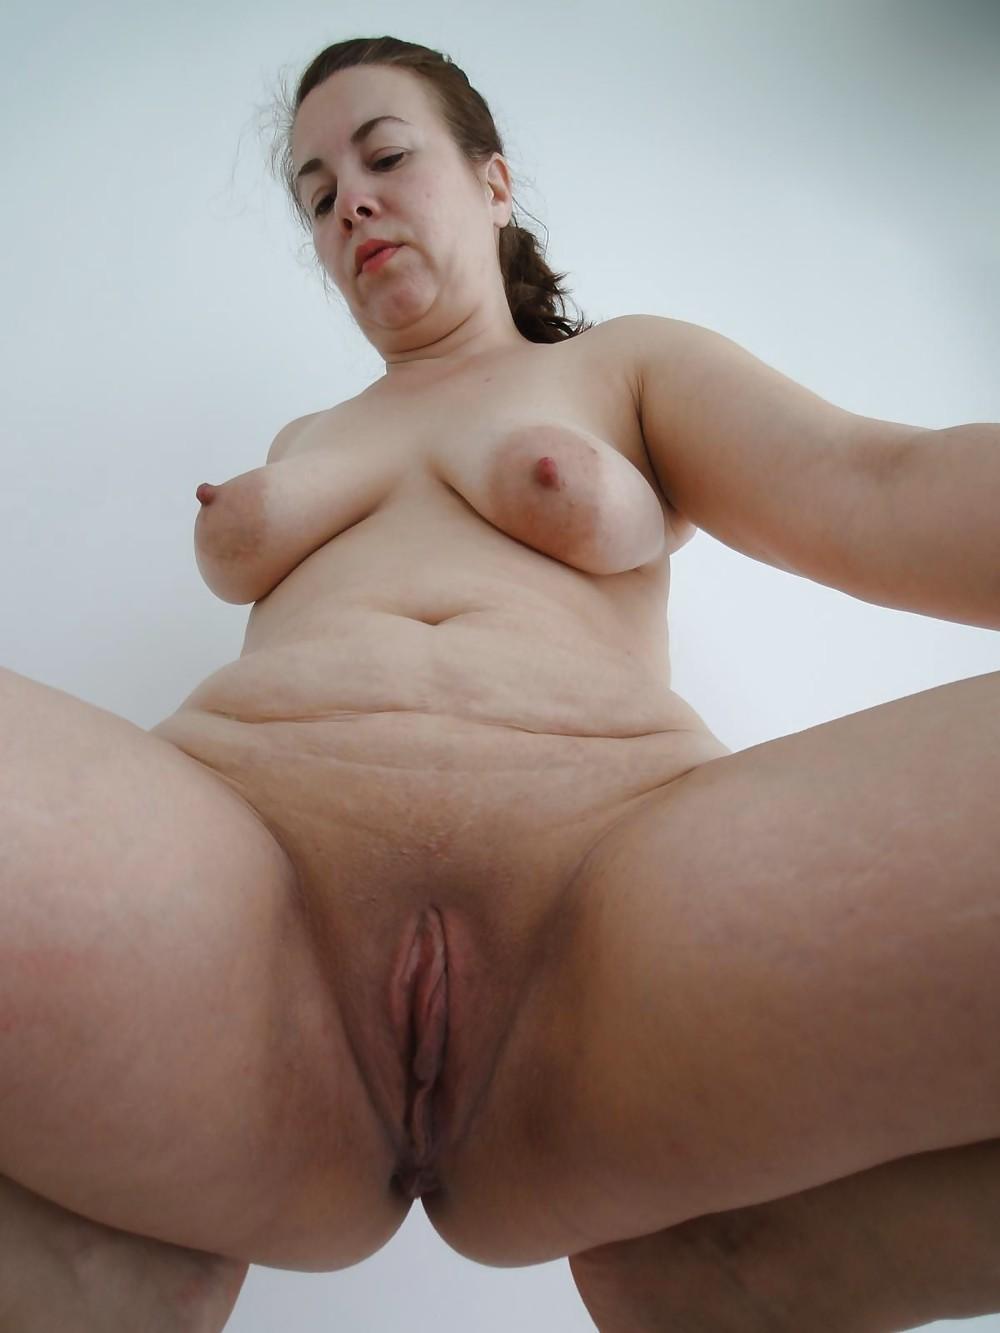 Midget anal fucked